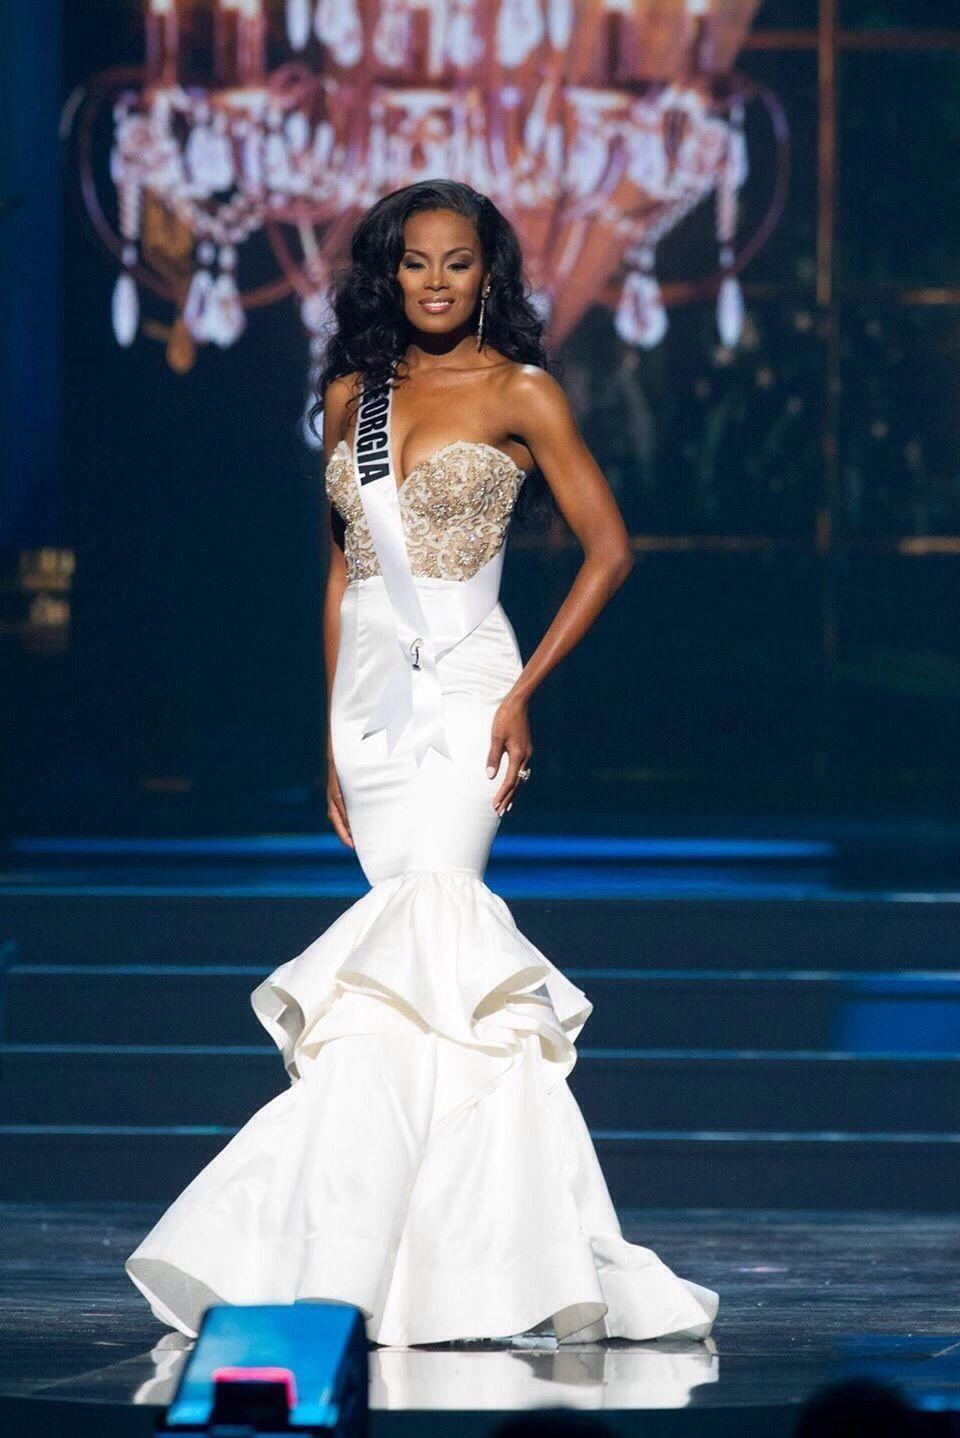 miss georgia, miss usa, pageant evening gown | p a g e a n t ...